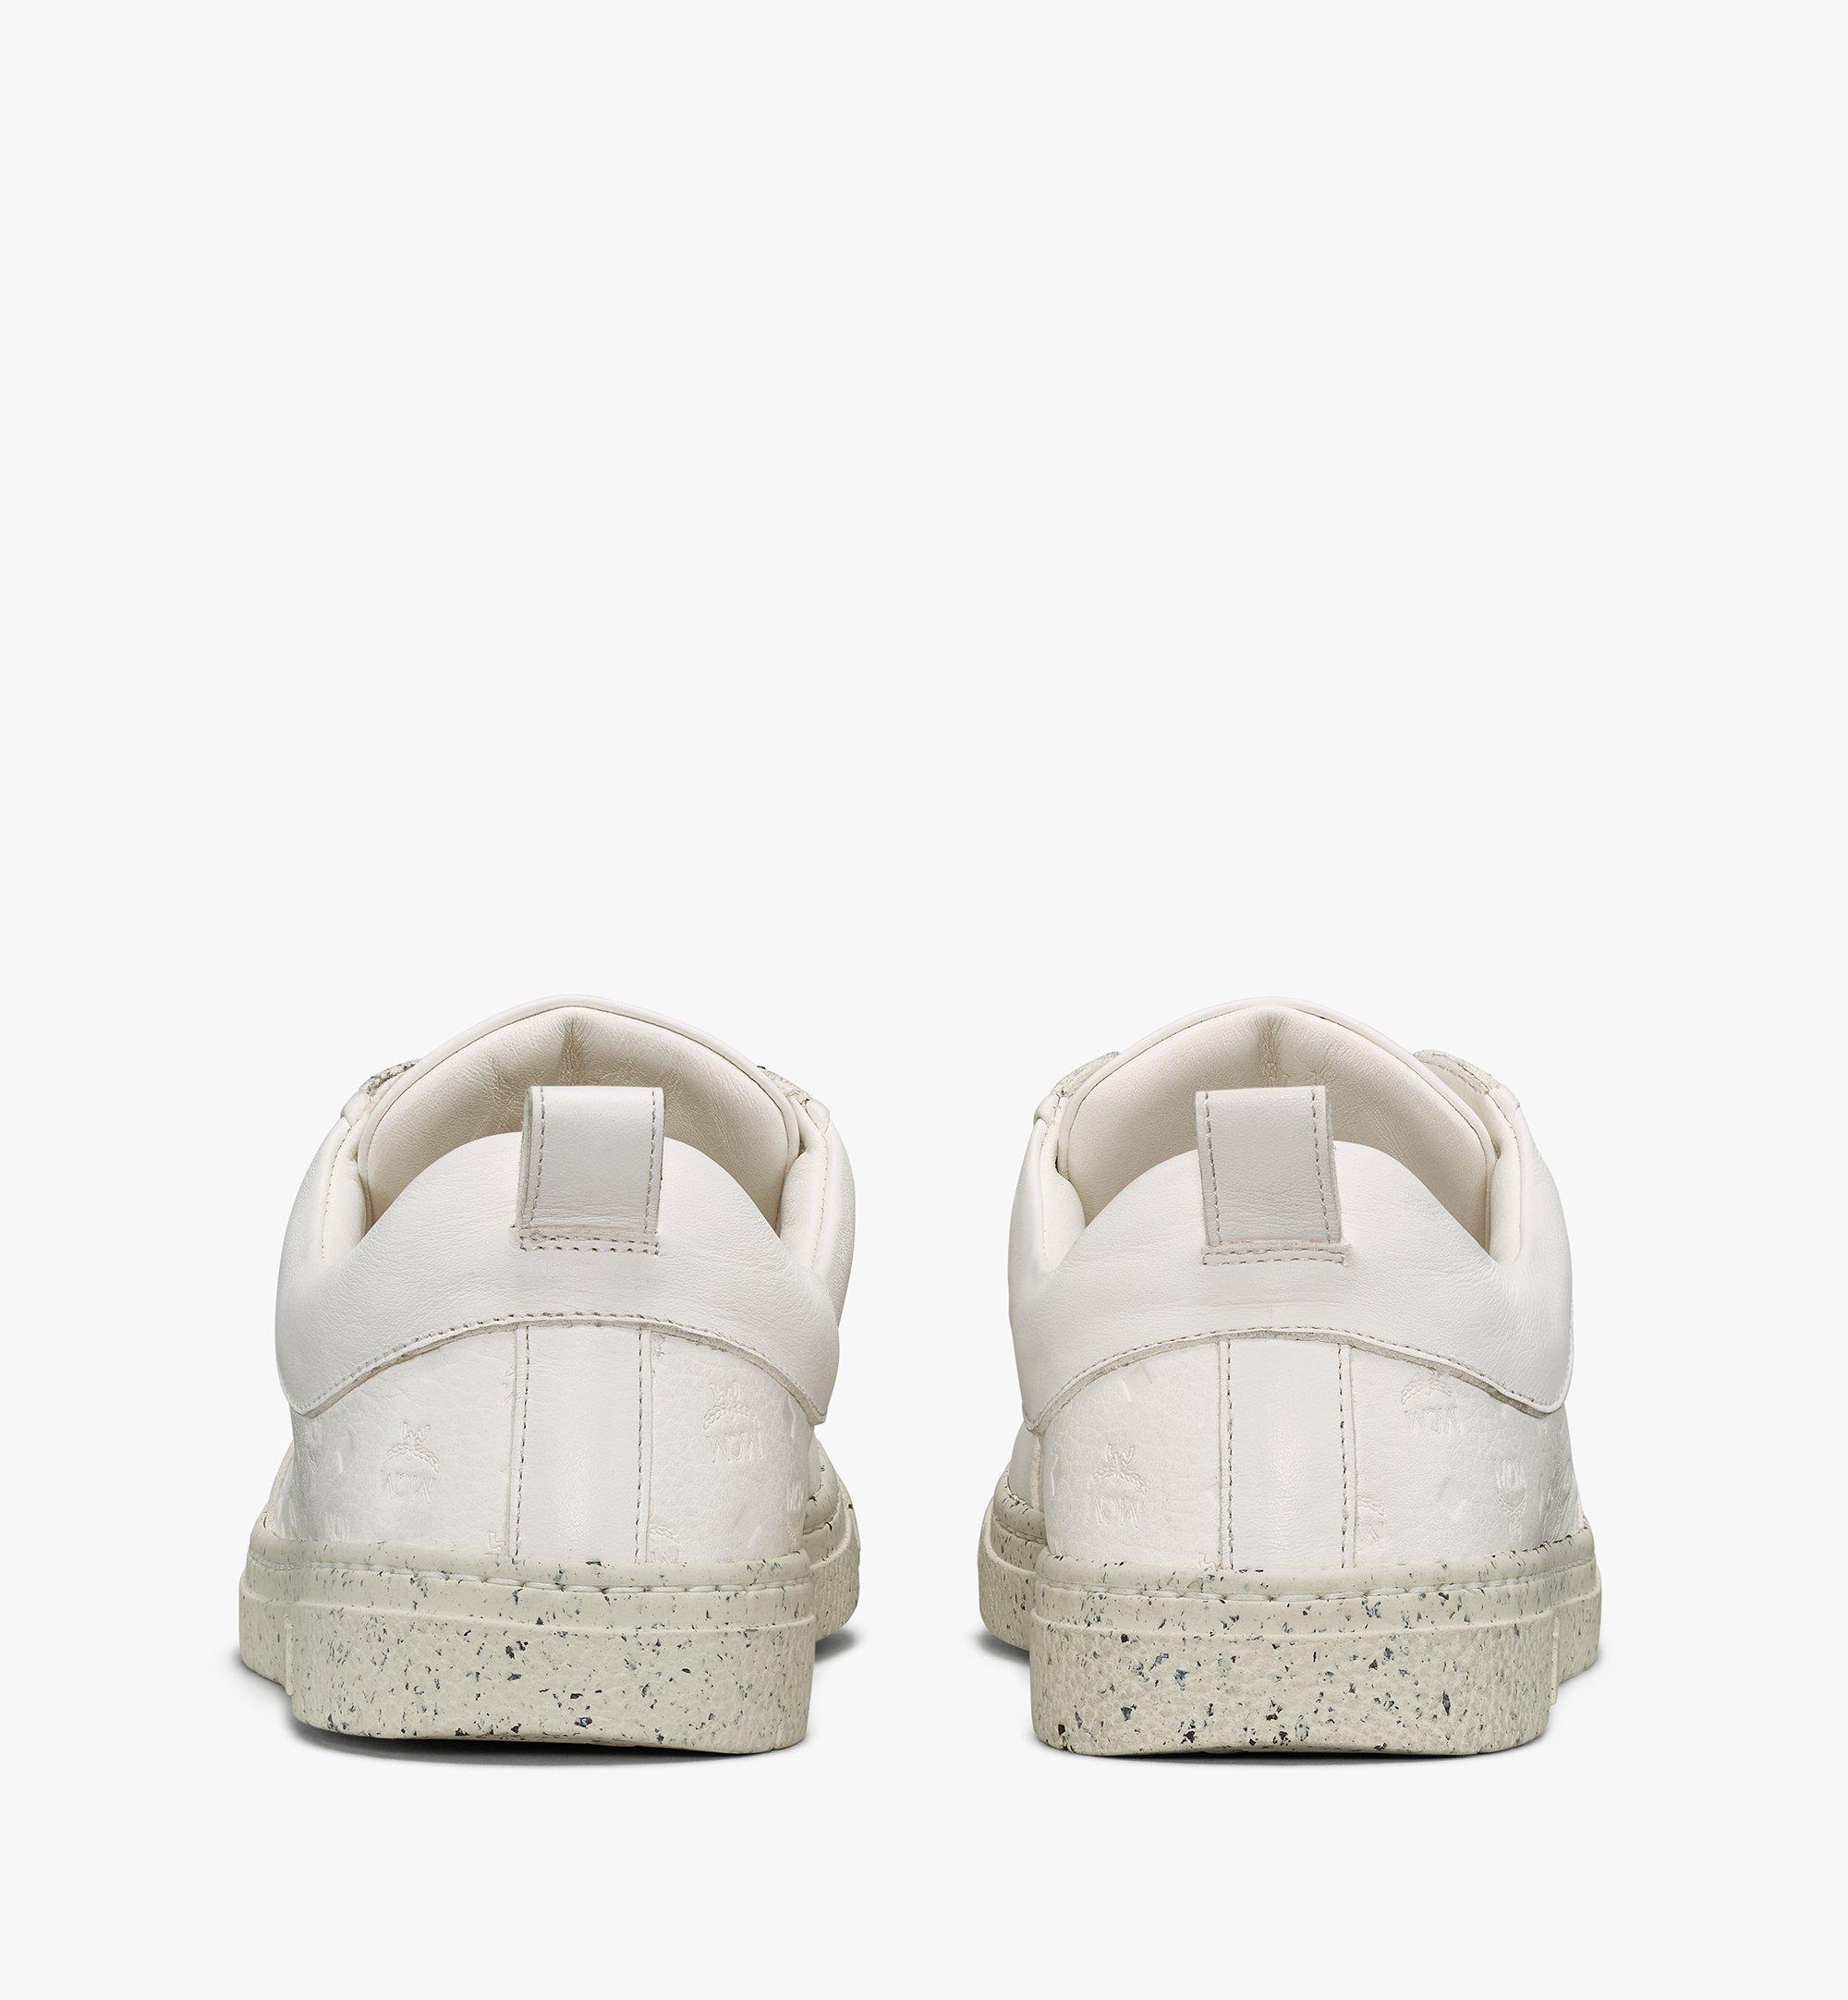 MCM Women's Sustainable Terrain Lo Sneakers White MESAAMM18WT036 Alternate View 3